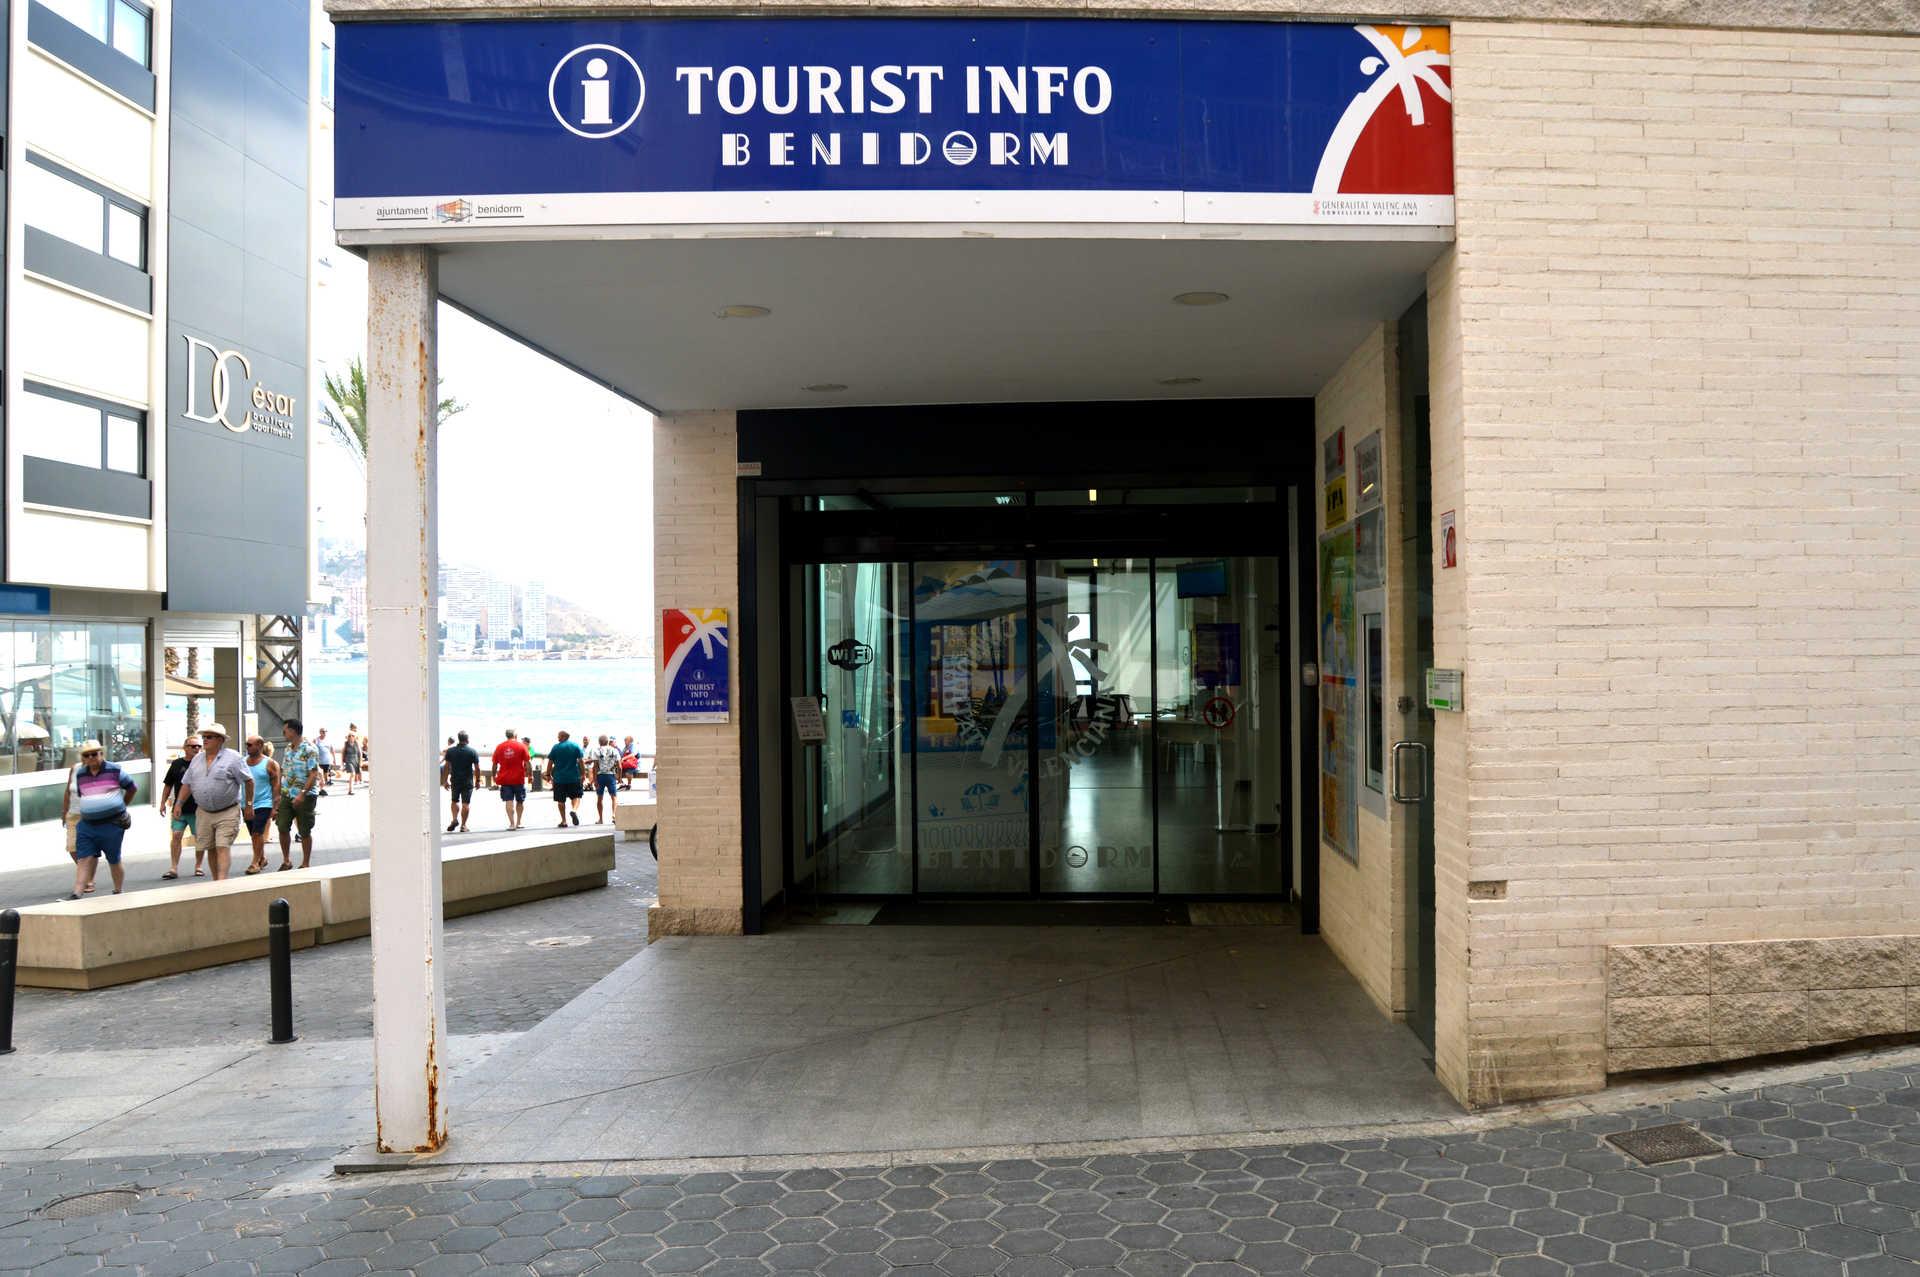 TOURIST INFO BENIDORM - CENTRO